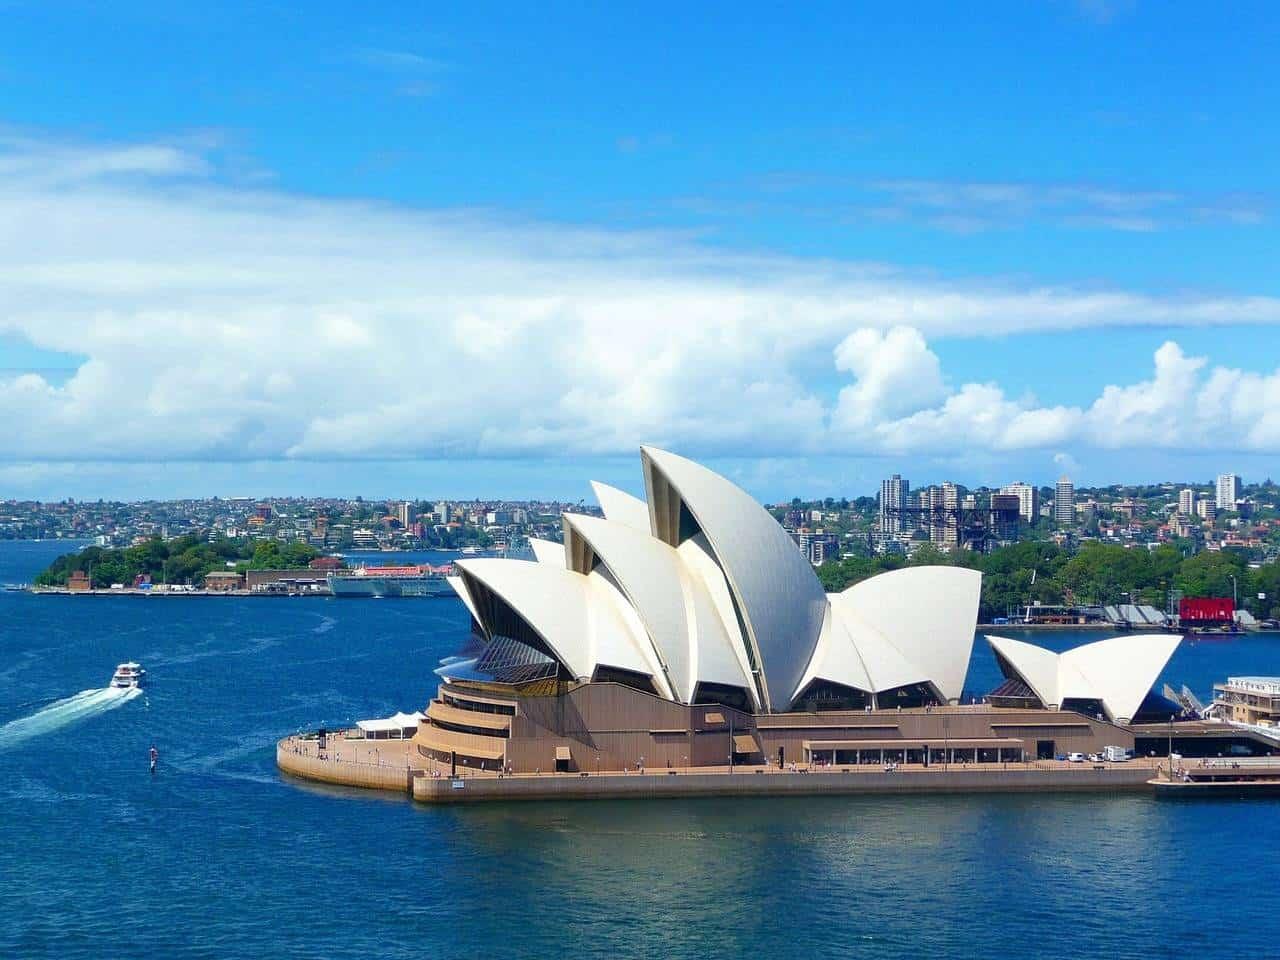 Why I would move to Australia